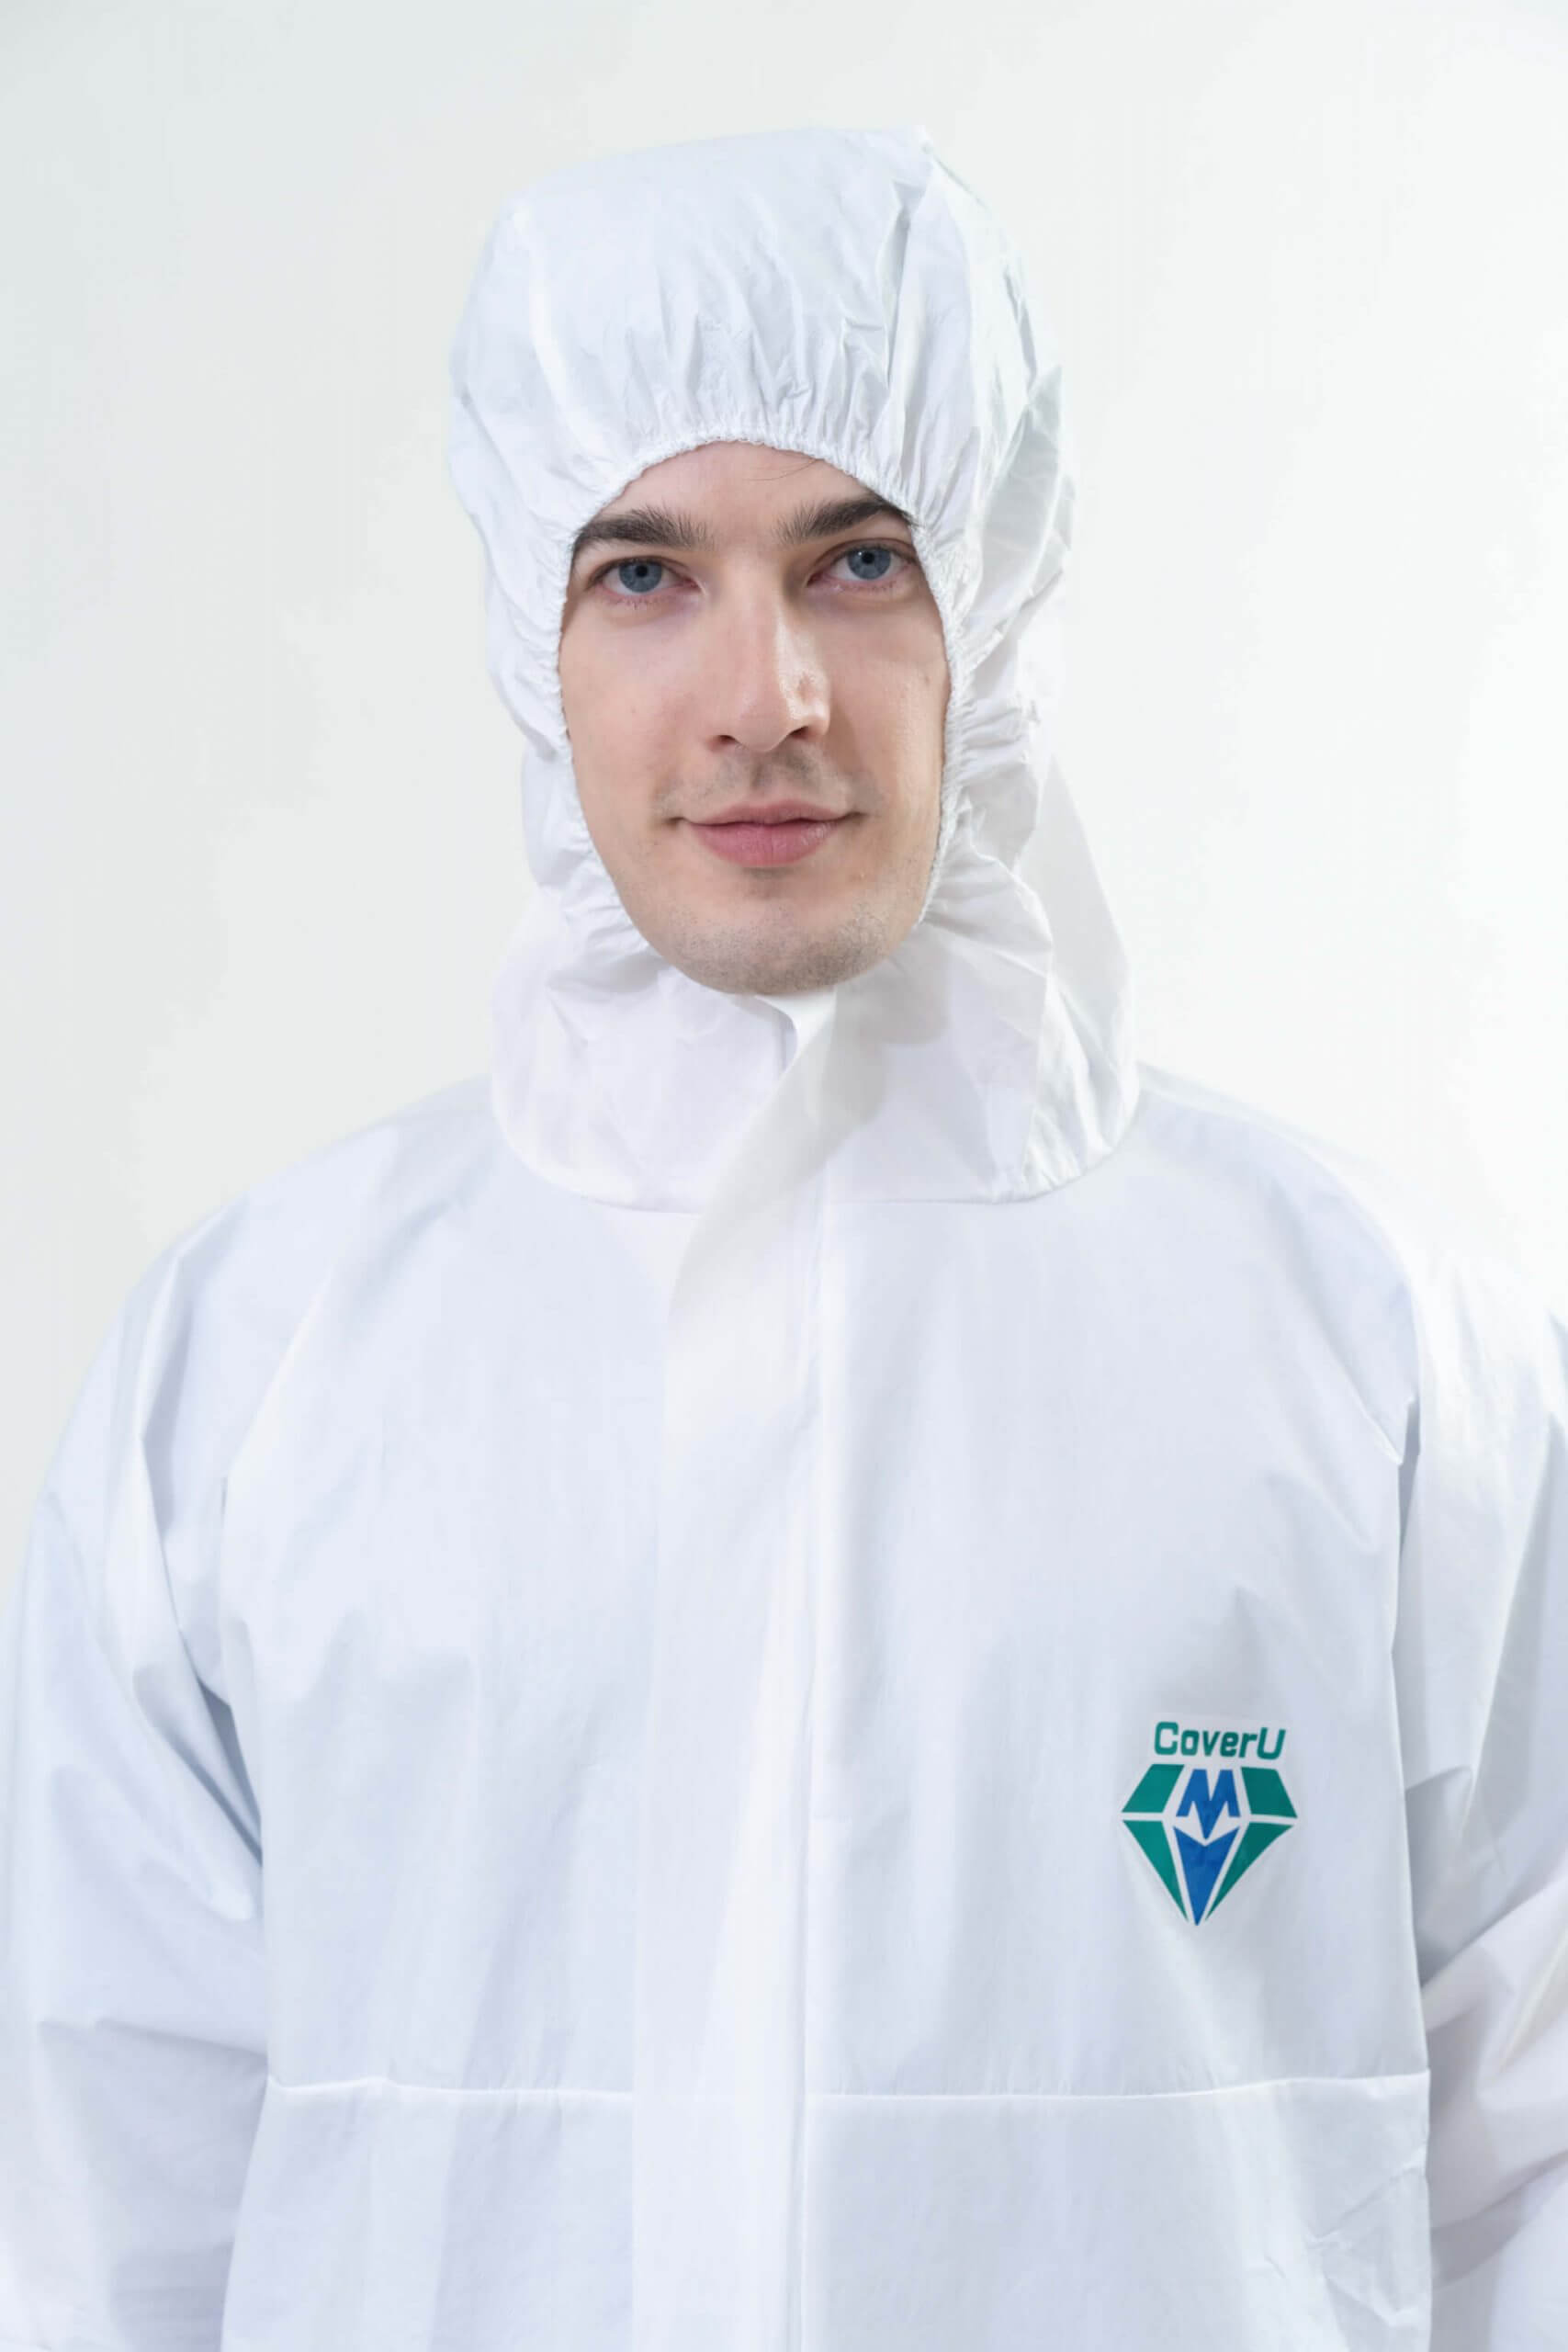 Medtecs CoverU PPE manufaturing 美德醫療個人防護設備製造商